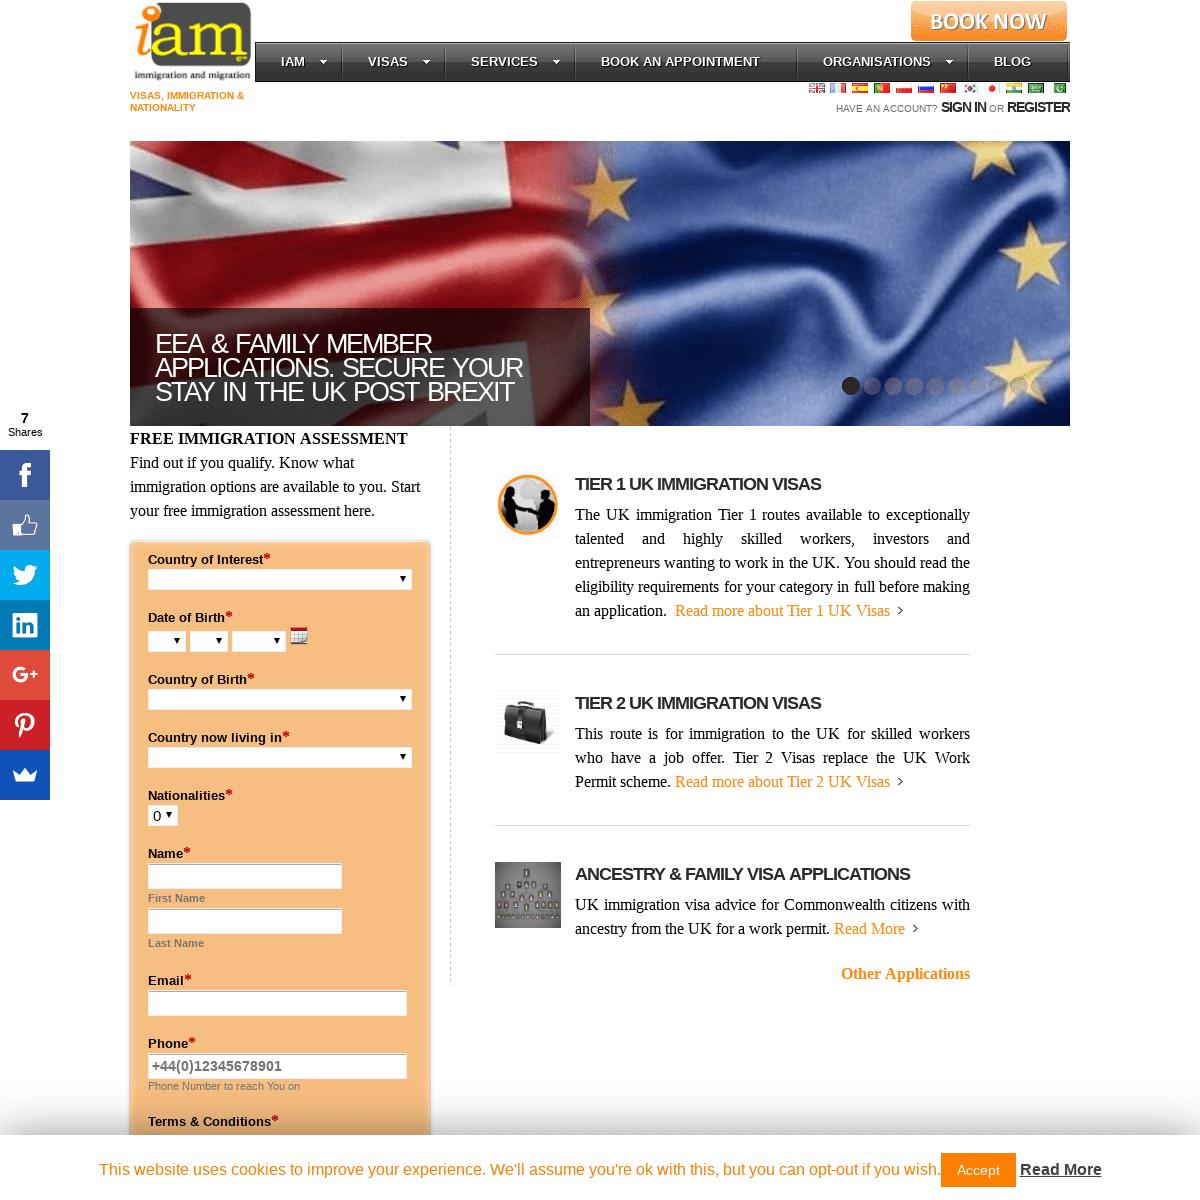 iam - IAM (Immigration and Migration) - UK